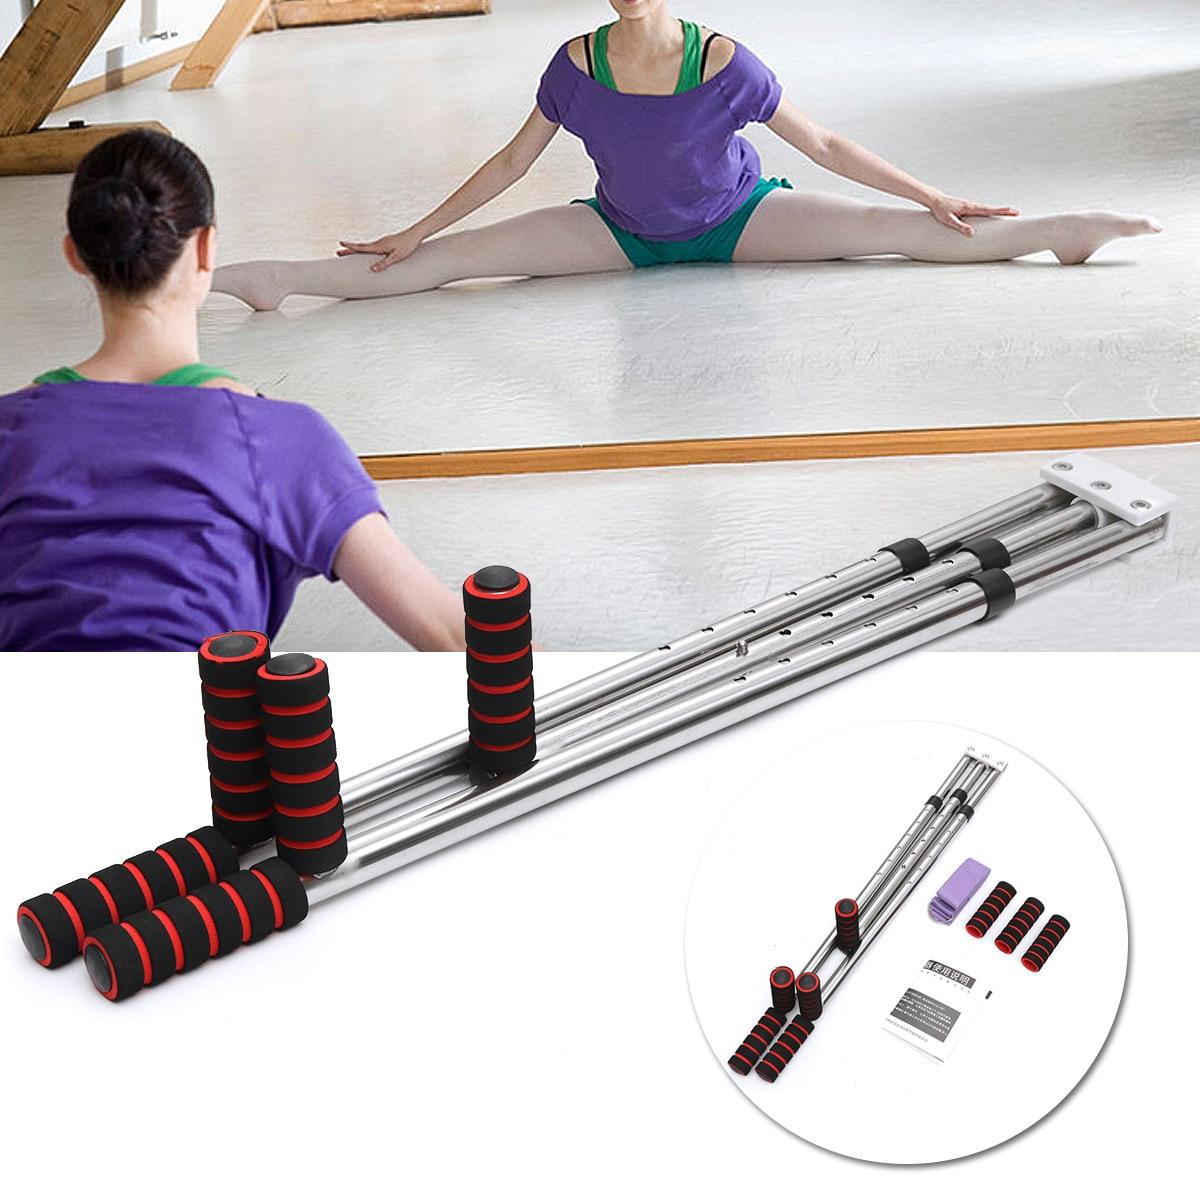 1Set Ballet Leg Extension Machine Flexibility Training Split Legs Ligament Stretcher Professional Split Legs Training Equipments leg extension split machine